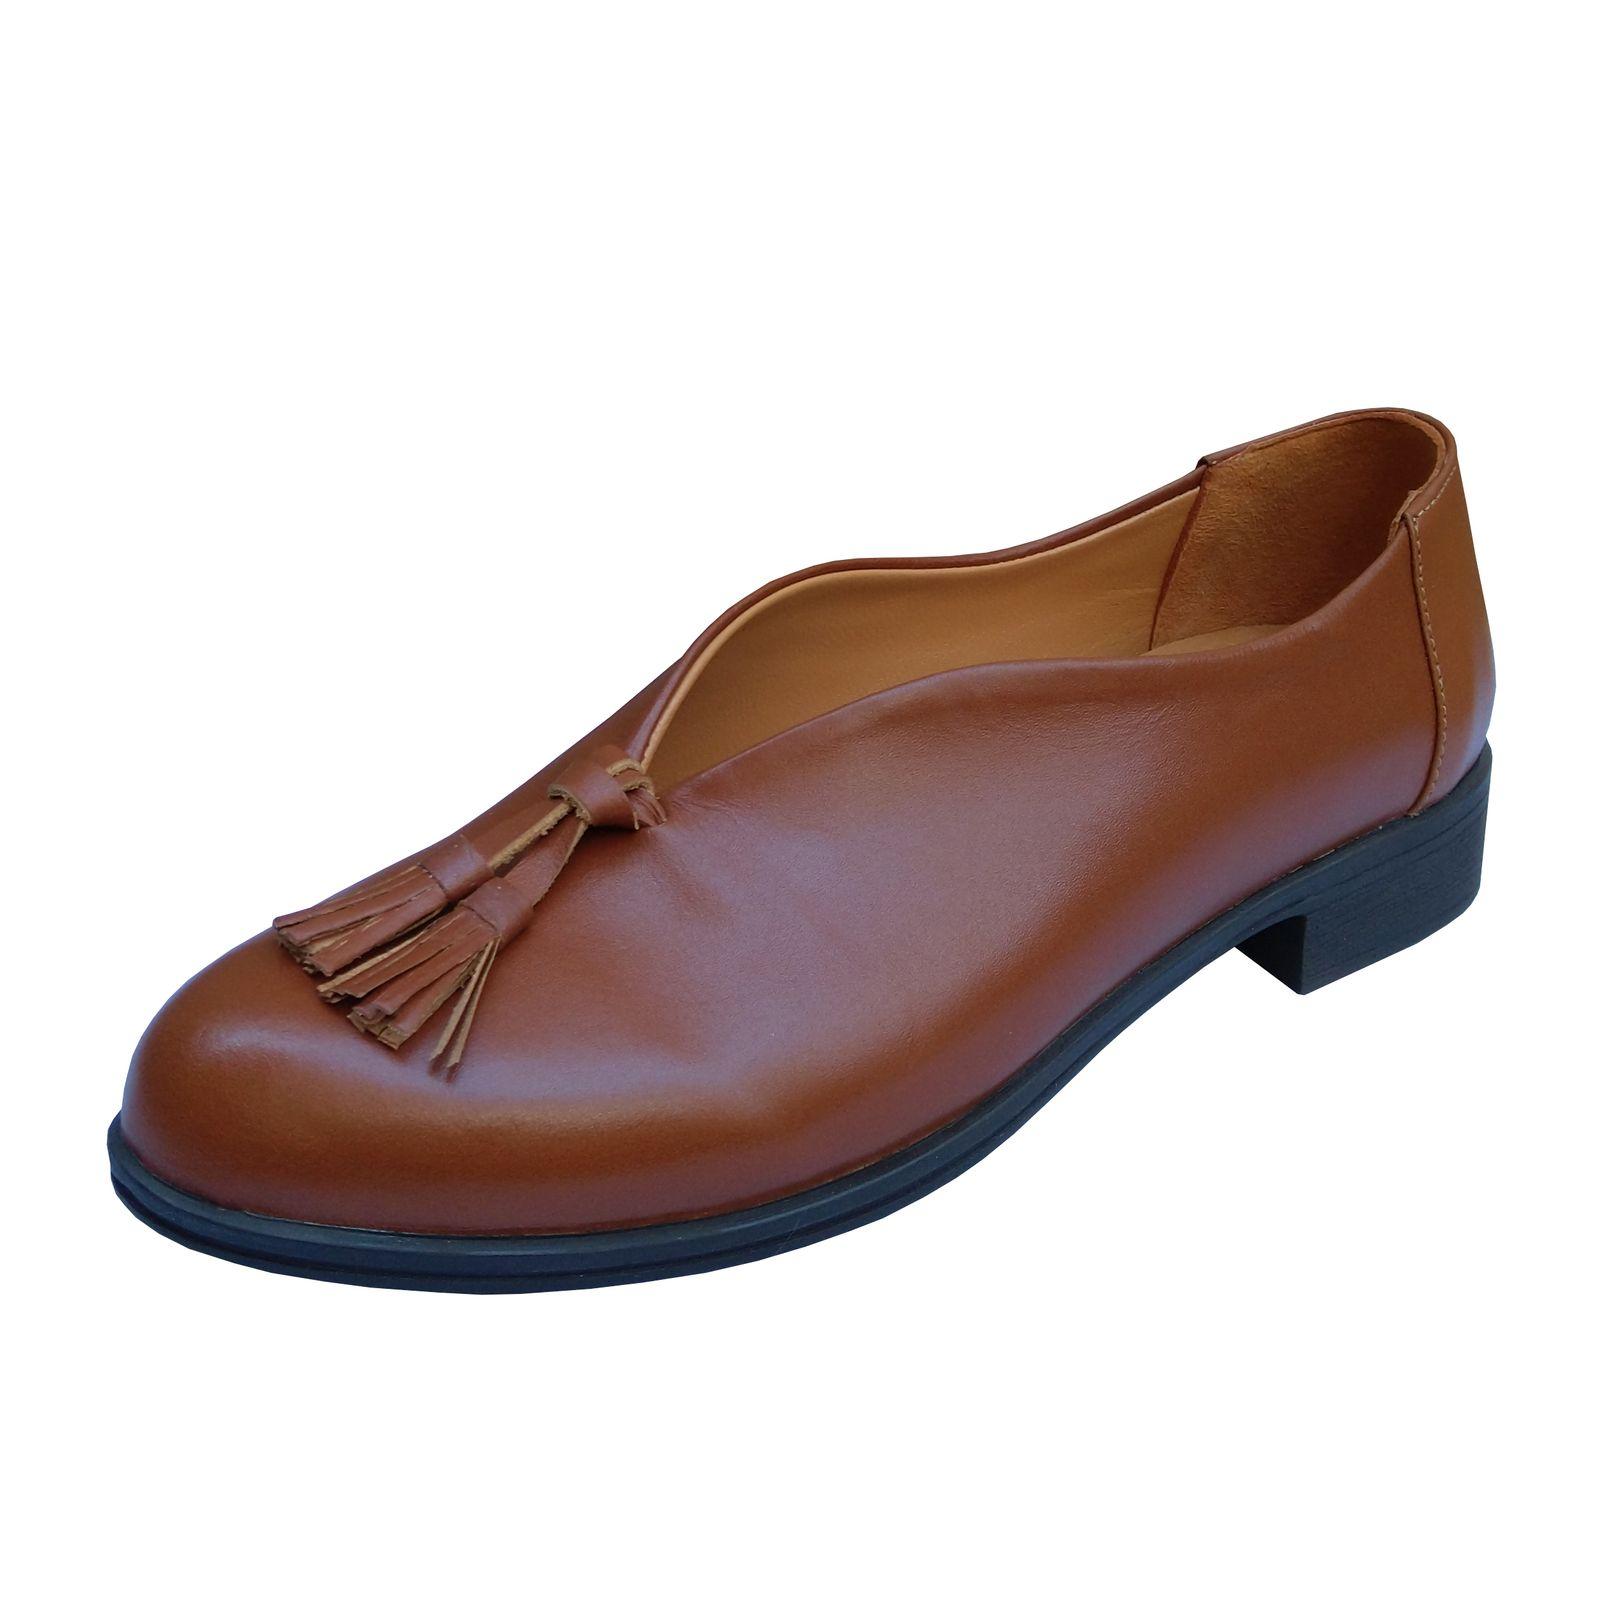 کفش زنانه مدل SK 309 -  - 6